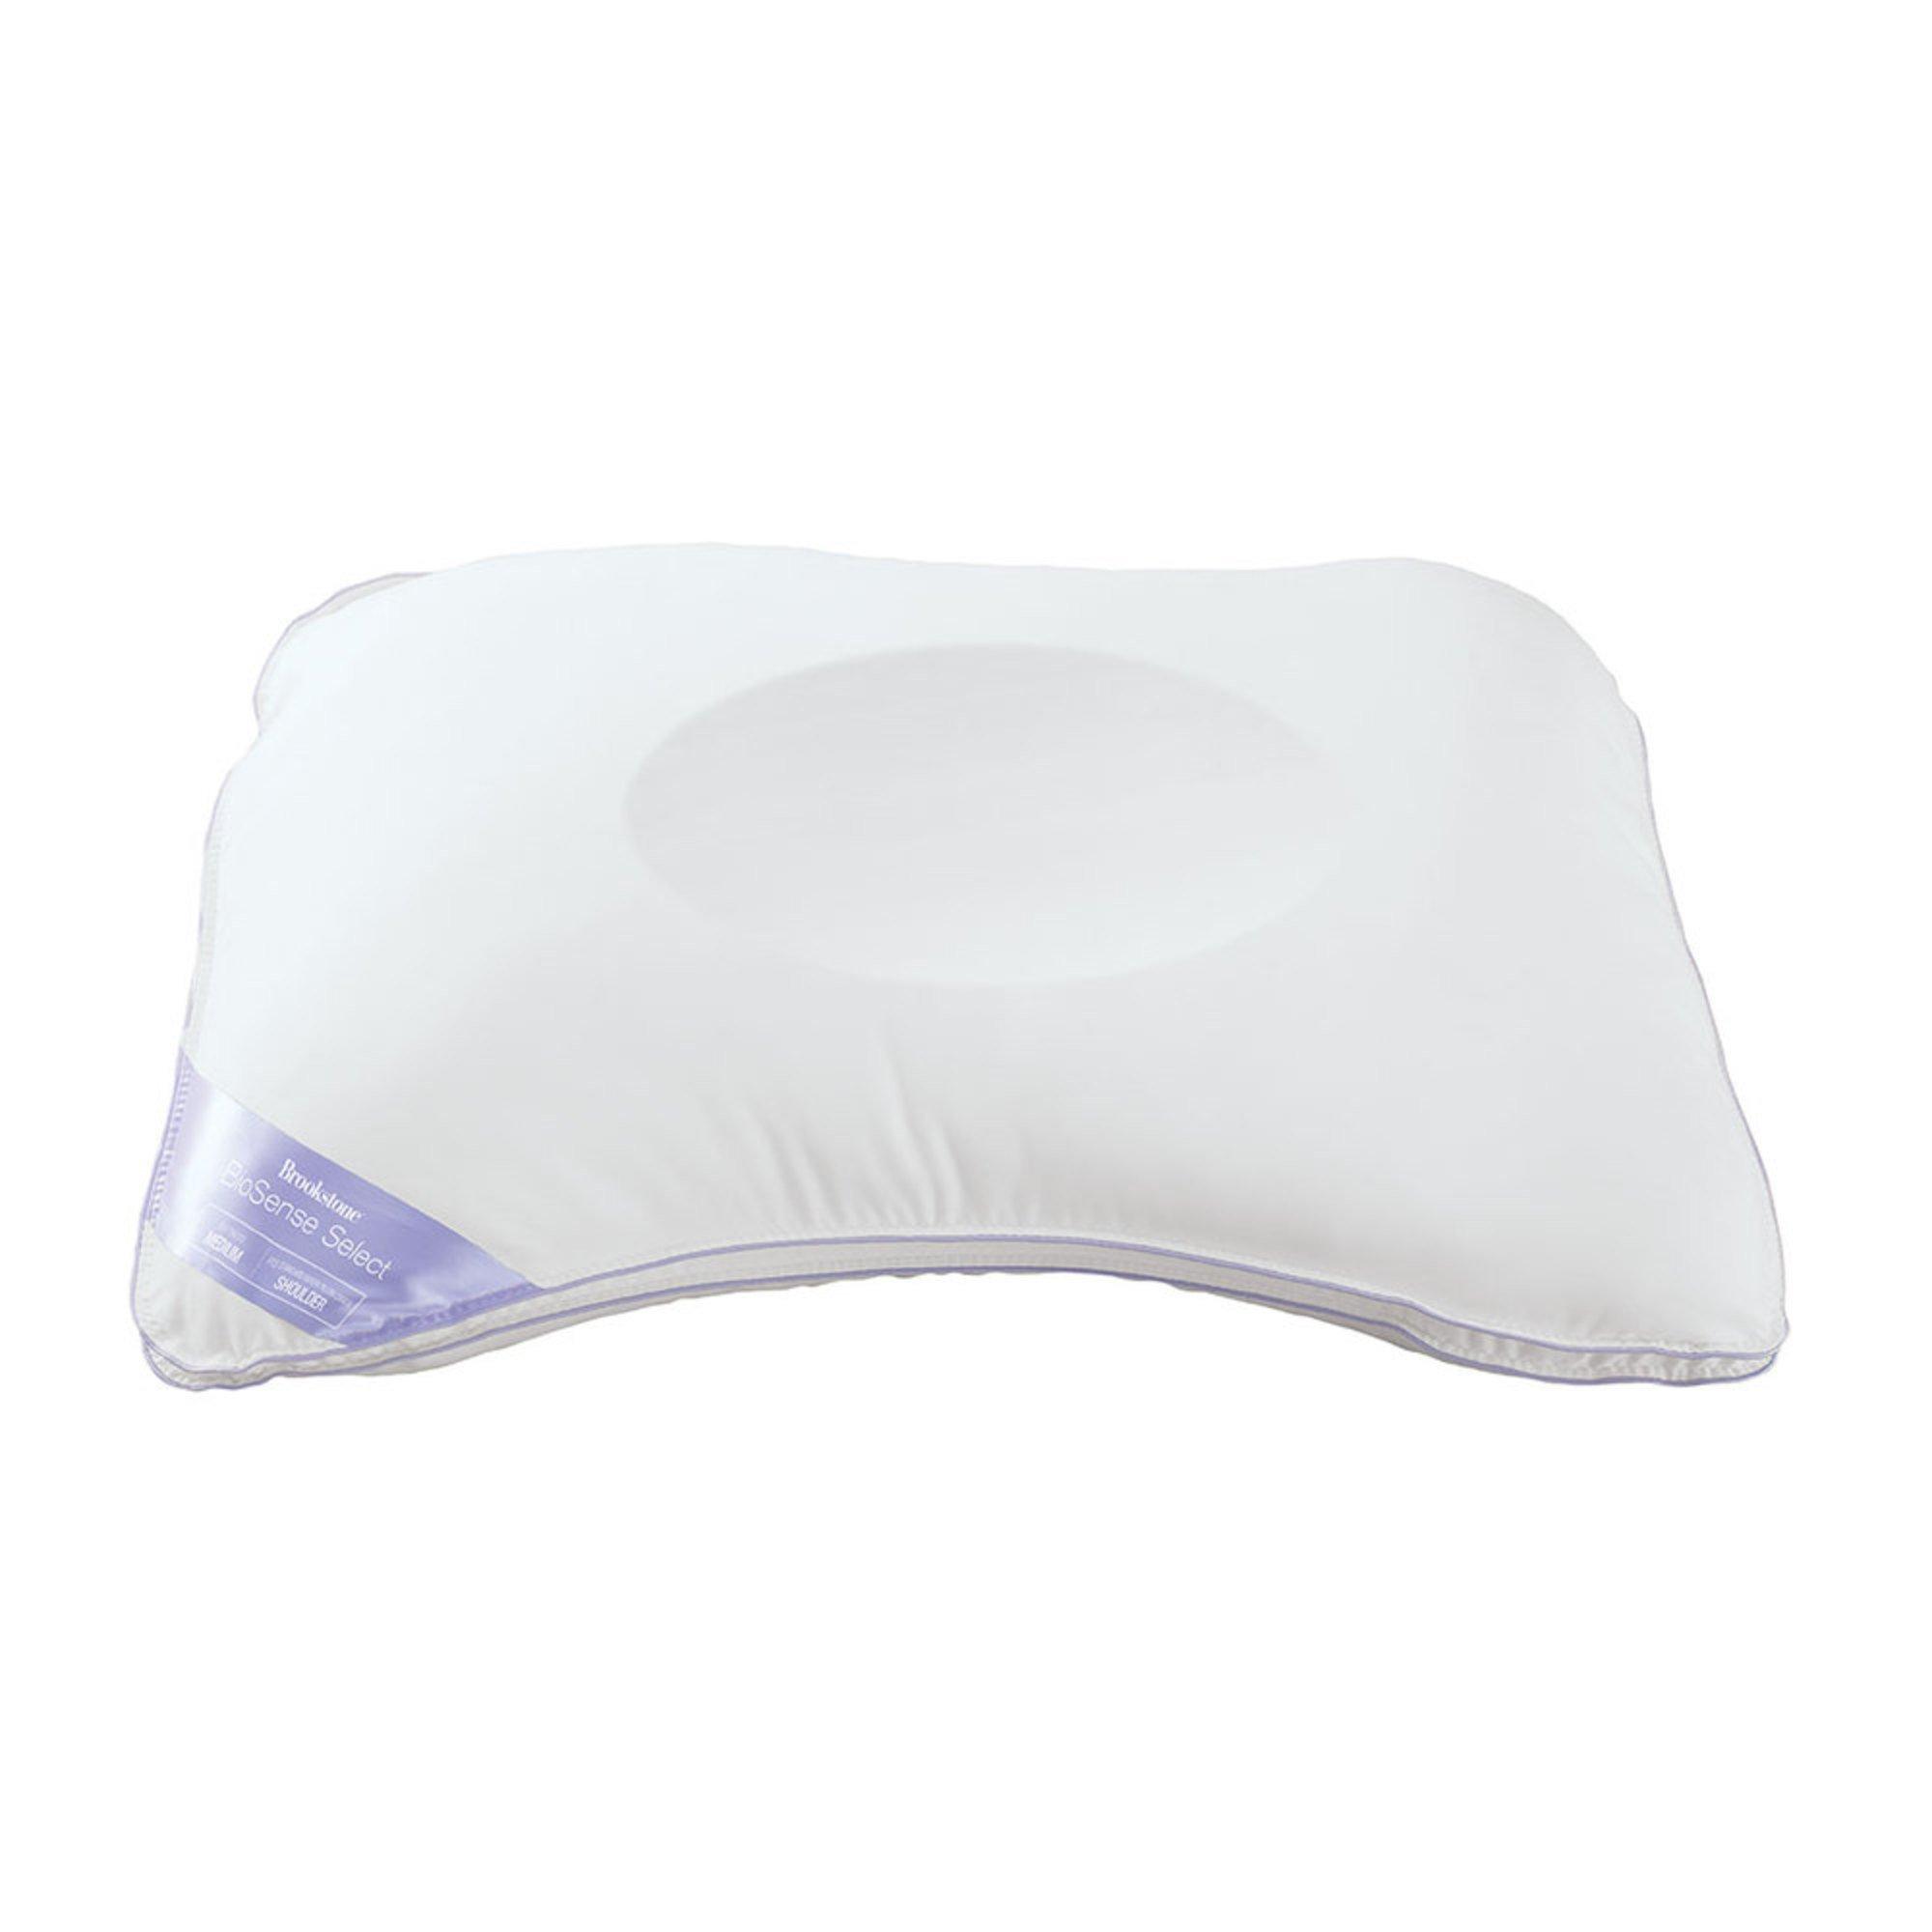 Biosense Select Side Sleeper Pillow